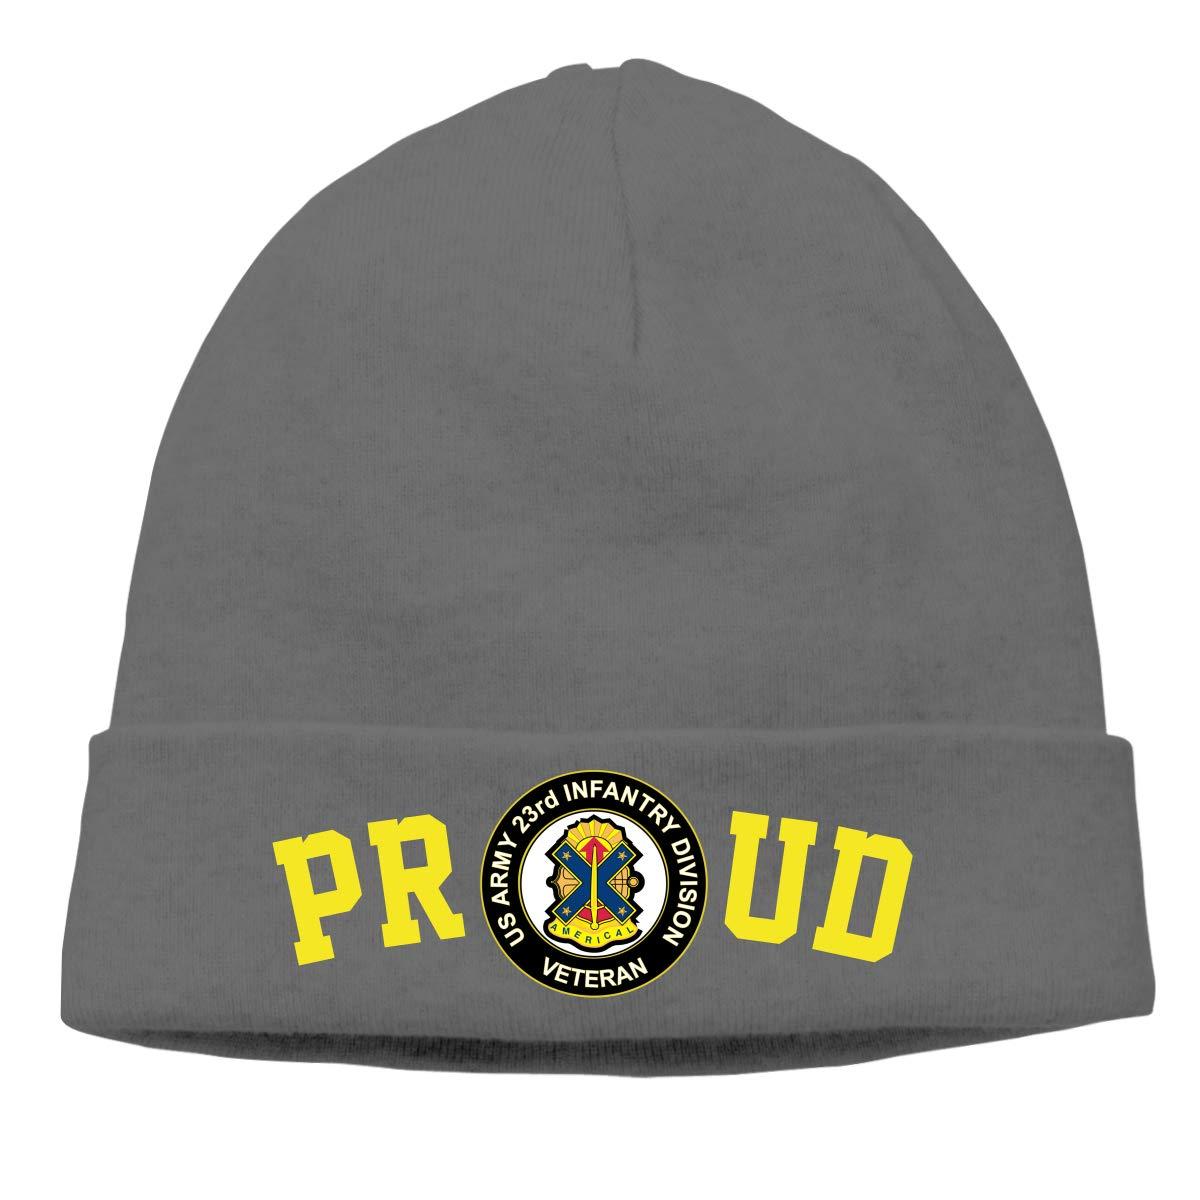 Proud US Army Veteran 23rd Infantry Division Mens Beanie Cap Skull Cap Winter Warm Knitting Hats.